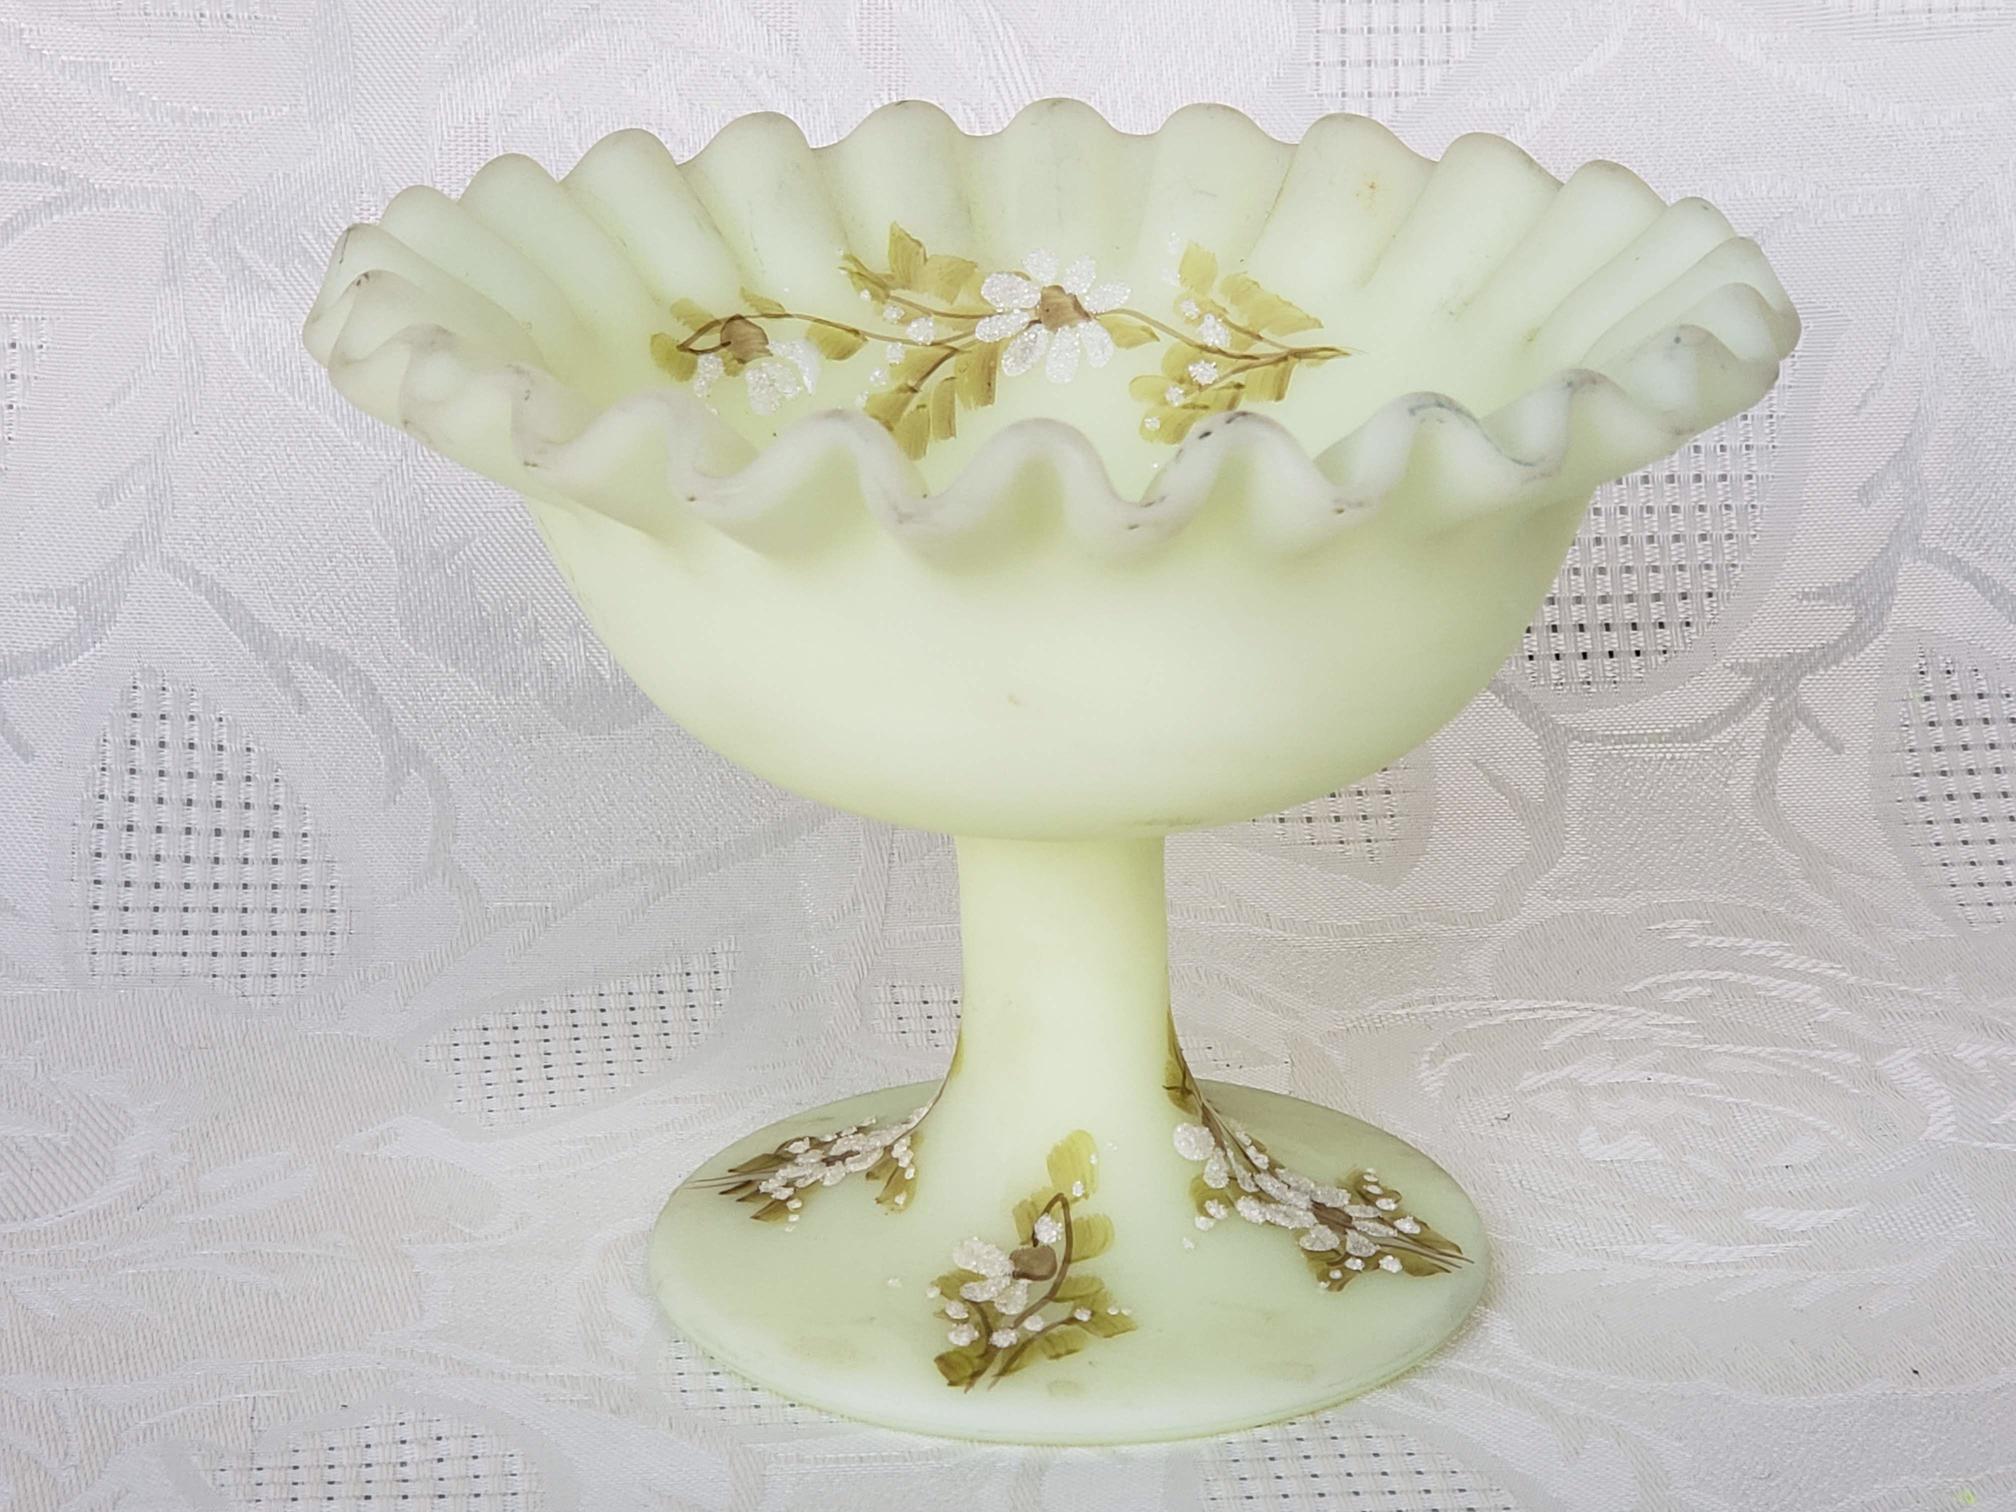 Vintage glass art candy dish